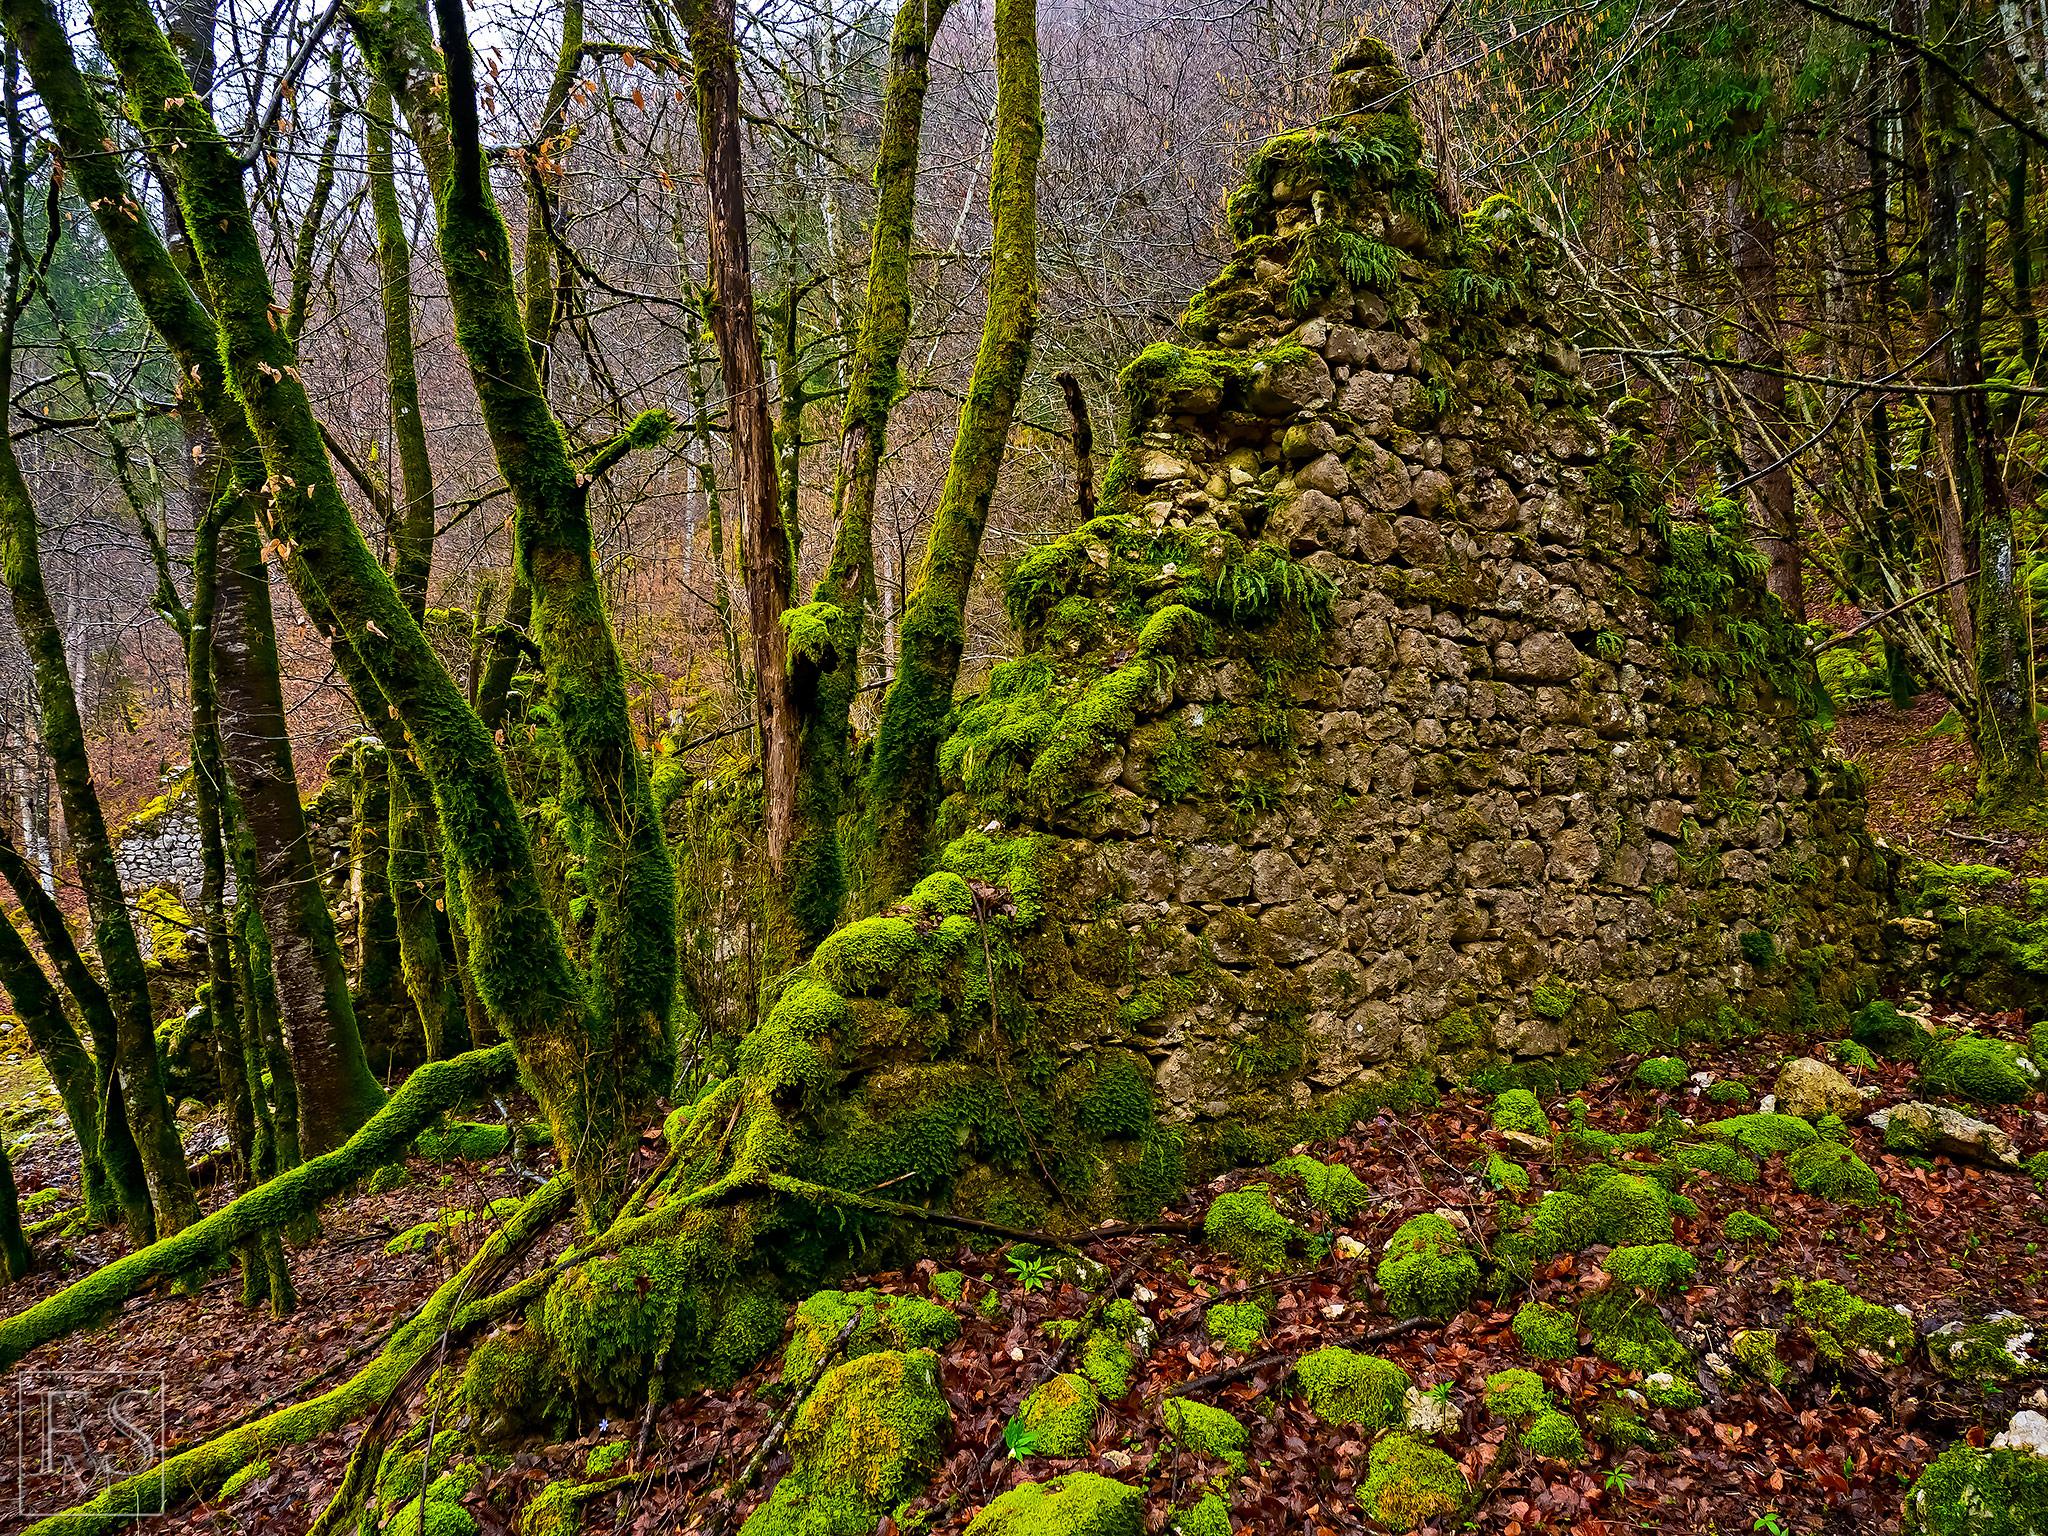 Crumpled Mossy Wall